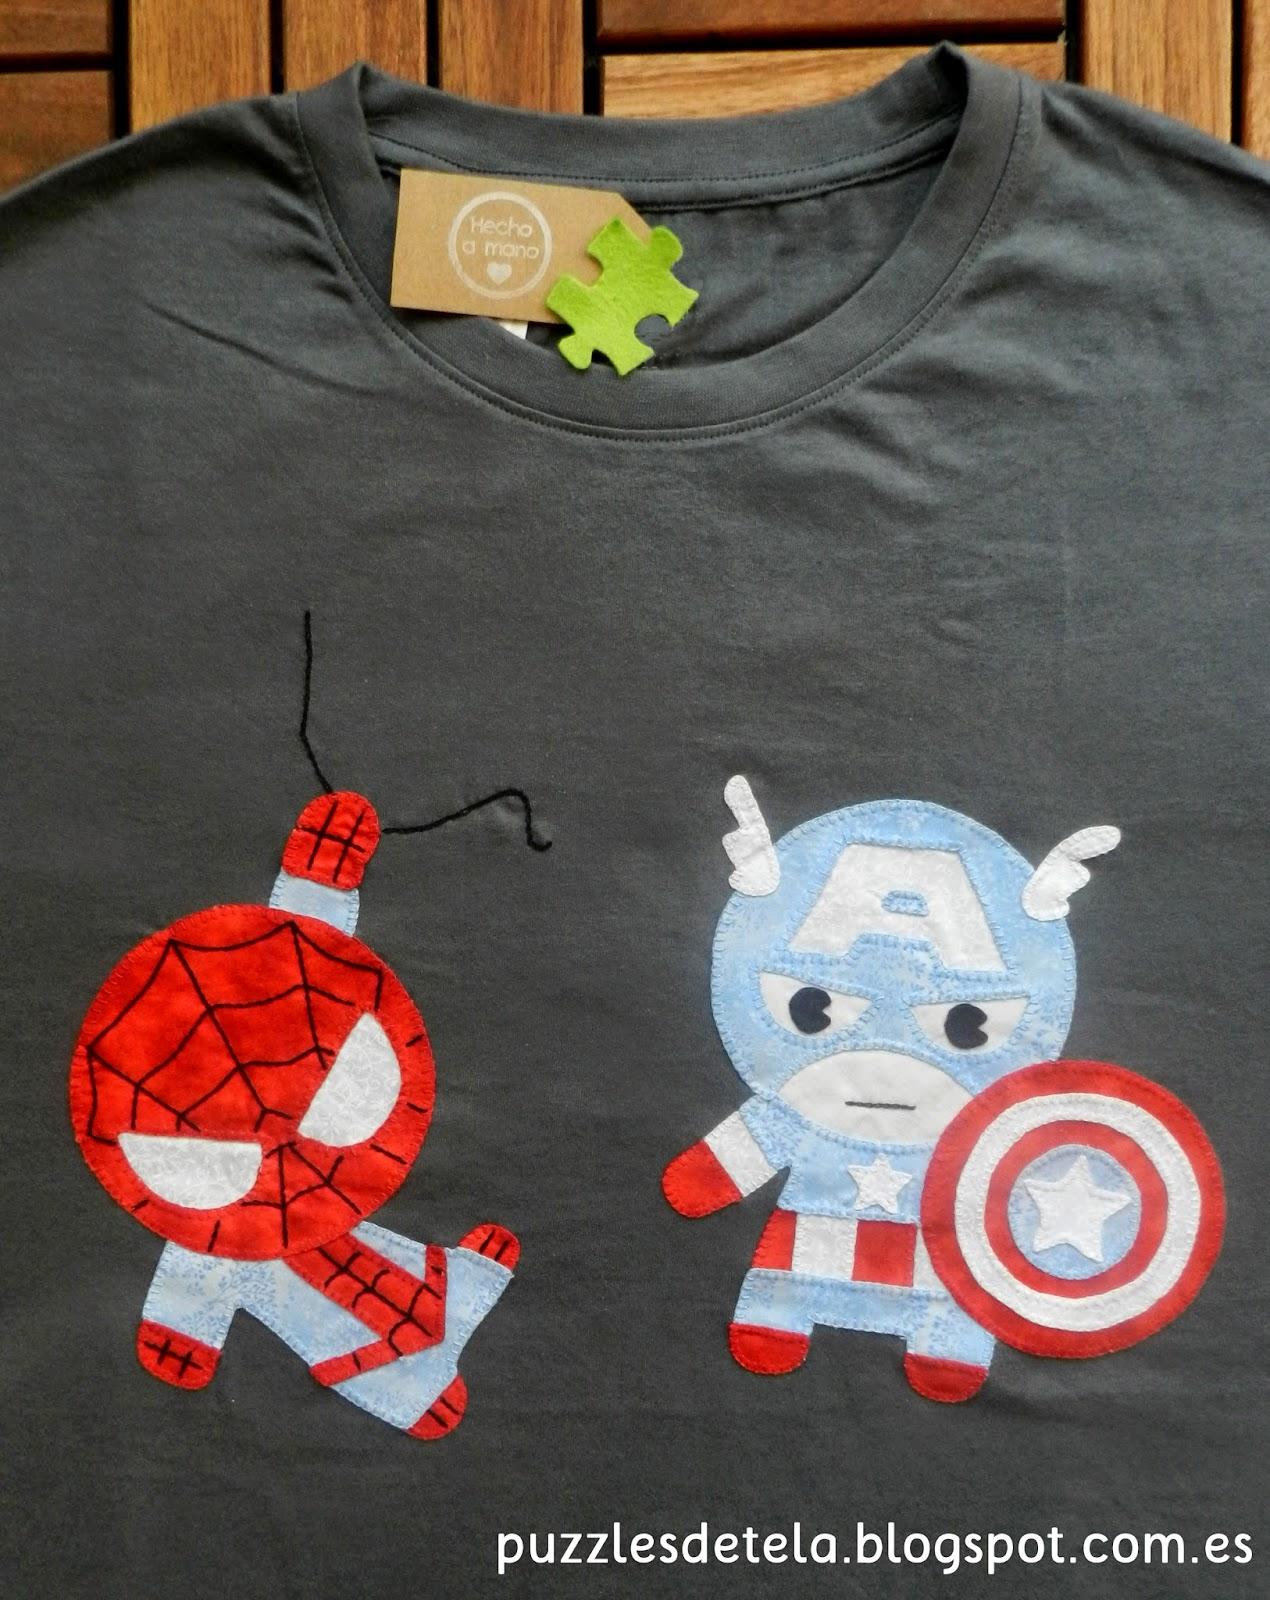 Salón del Cómic, Super mini héroes, Super héroes, superheroes, patchwork, super mini héroes patchwork, Spiderman, Capitán América, Camisetas super héroes patchwork, camisetas super héroes